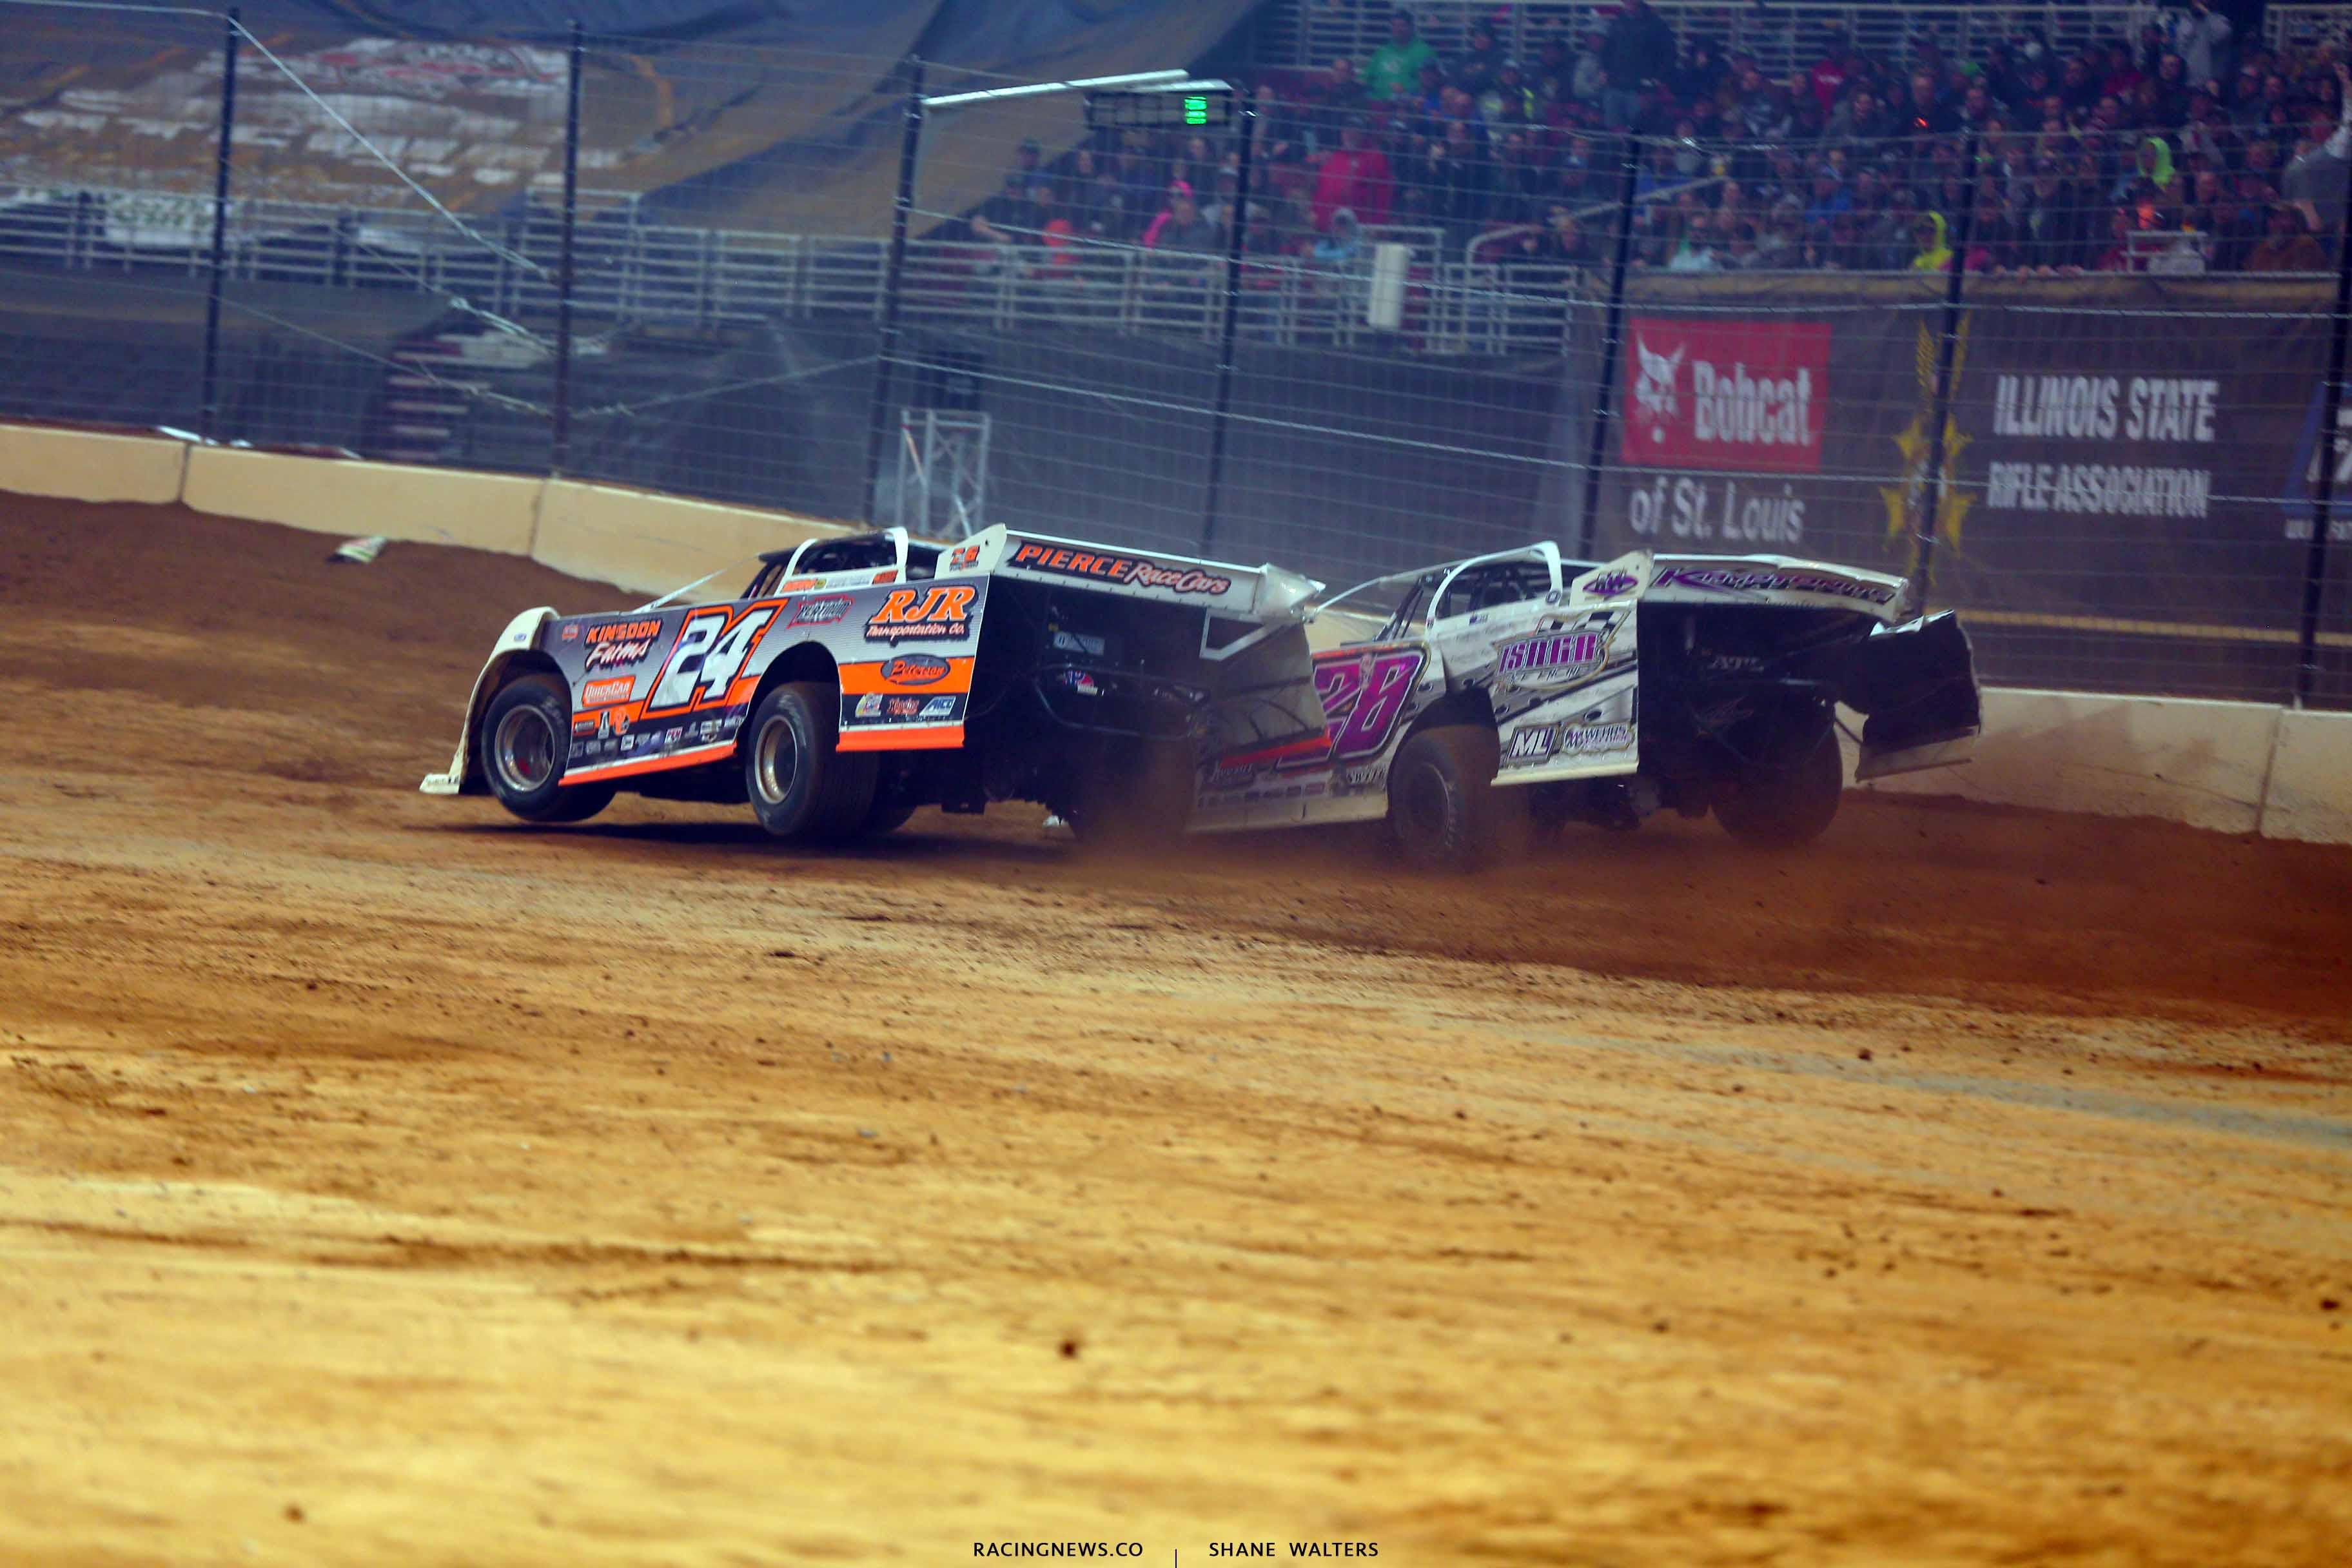 Ryan Unzicker and Tyler Carpenter in the Gateway Dirt Nationals 2594